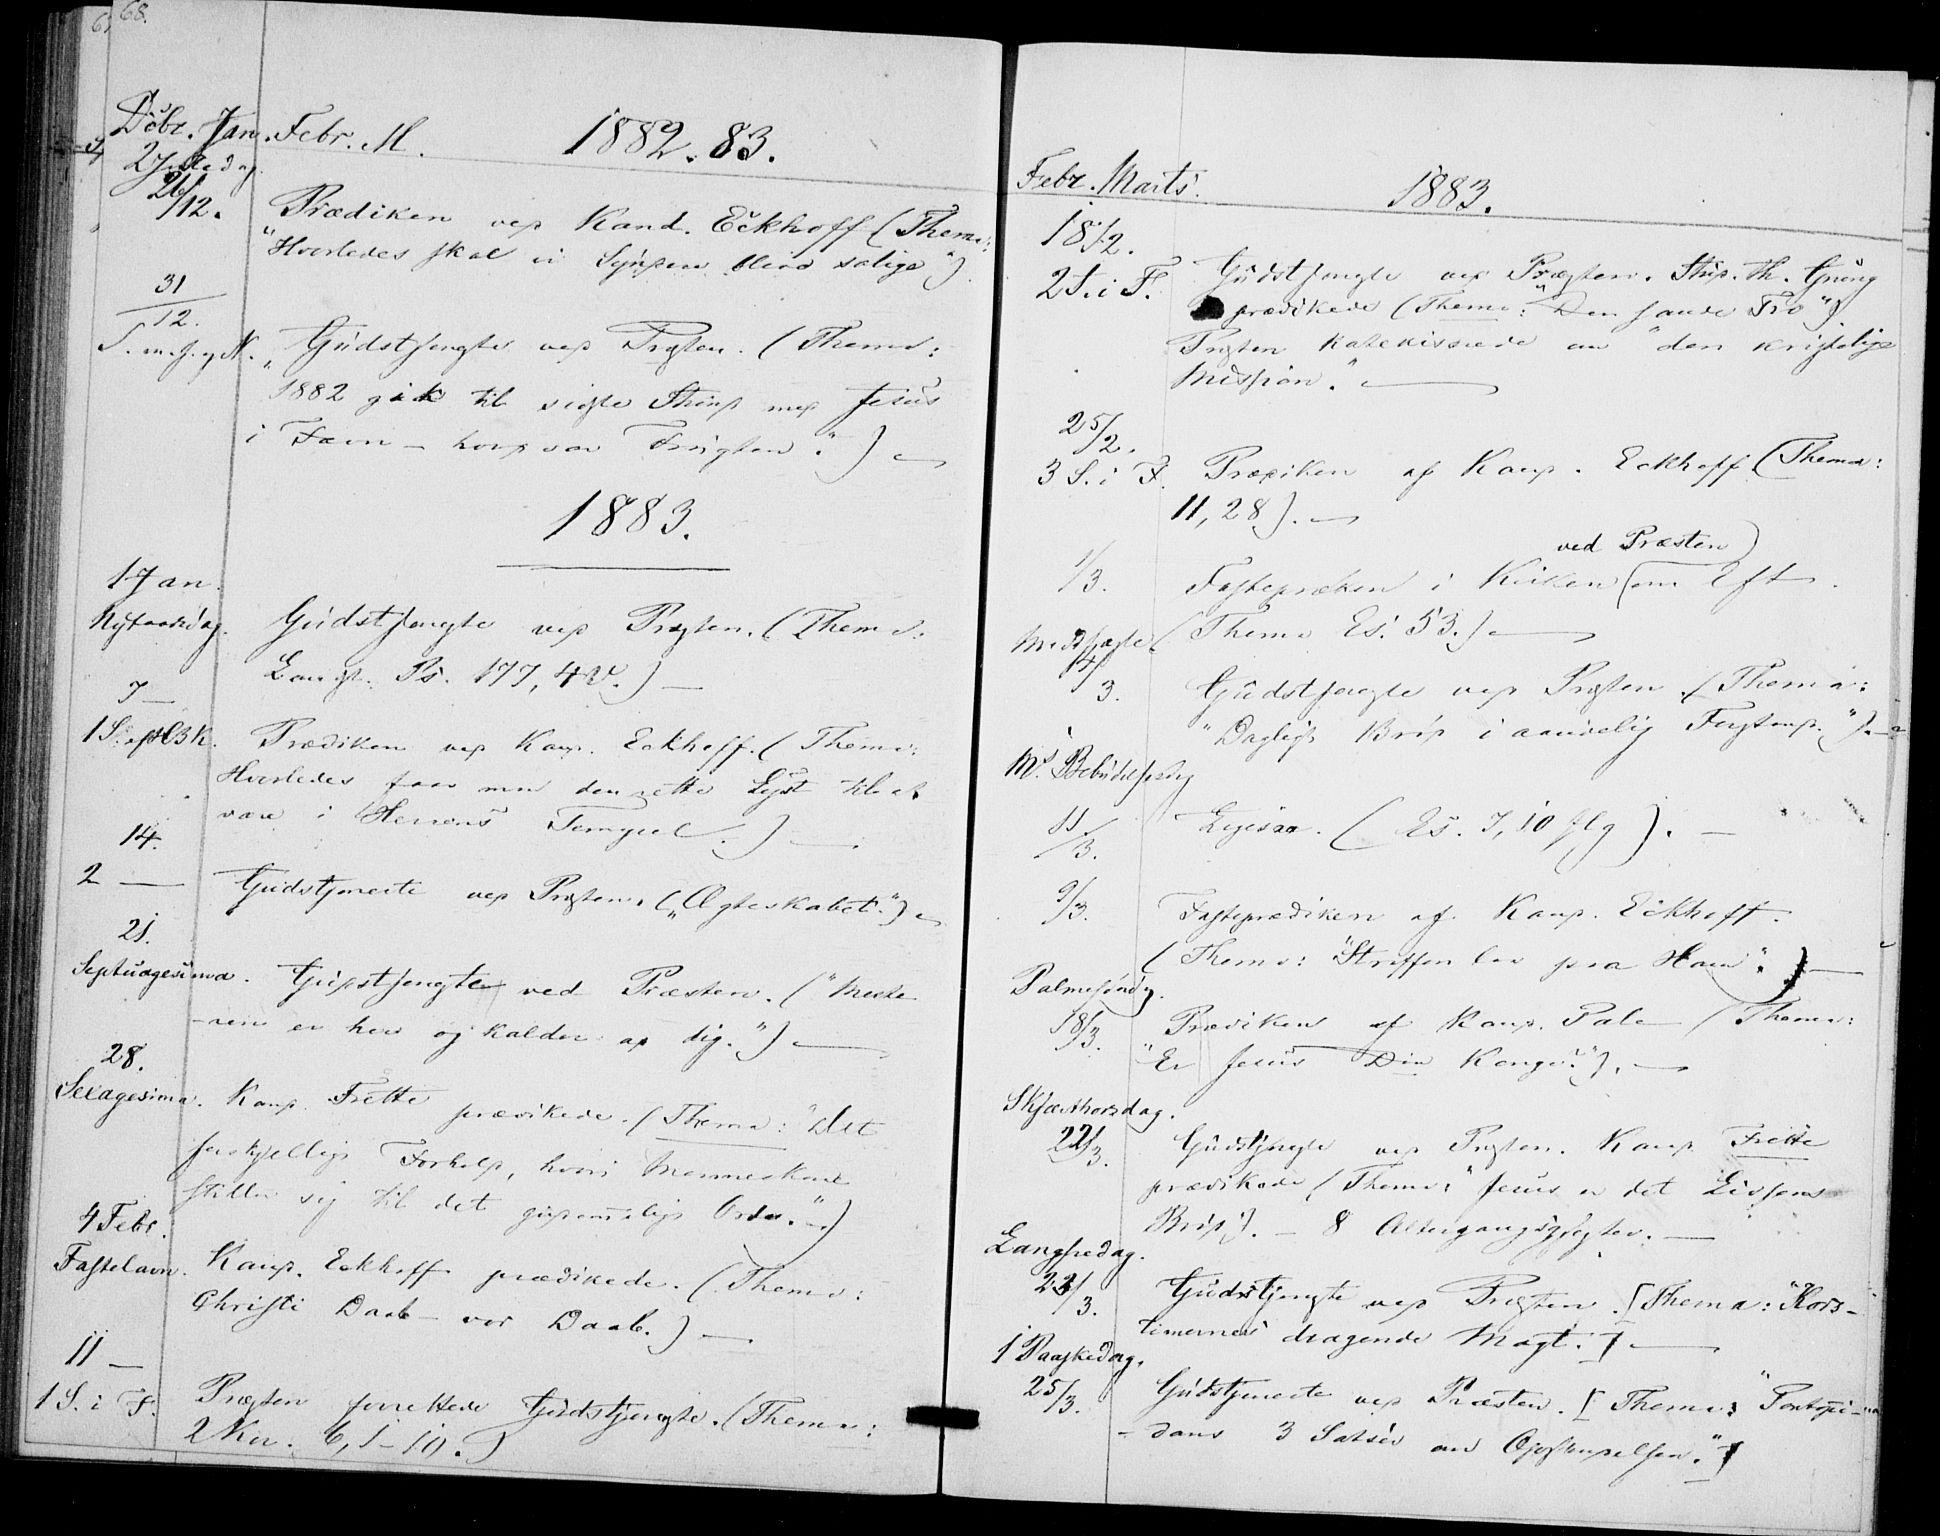 SAO, Akershus festnings slaveri Kirkebøker, F/Fa/L0002: Ministerialbok nr. 2, 1852-1883, s. 68